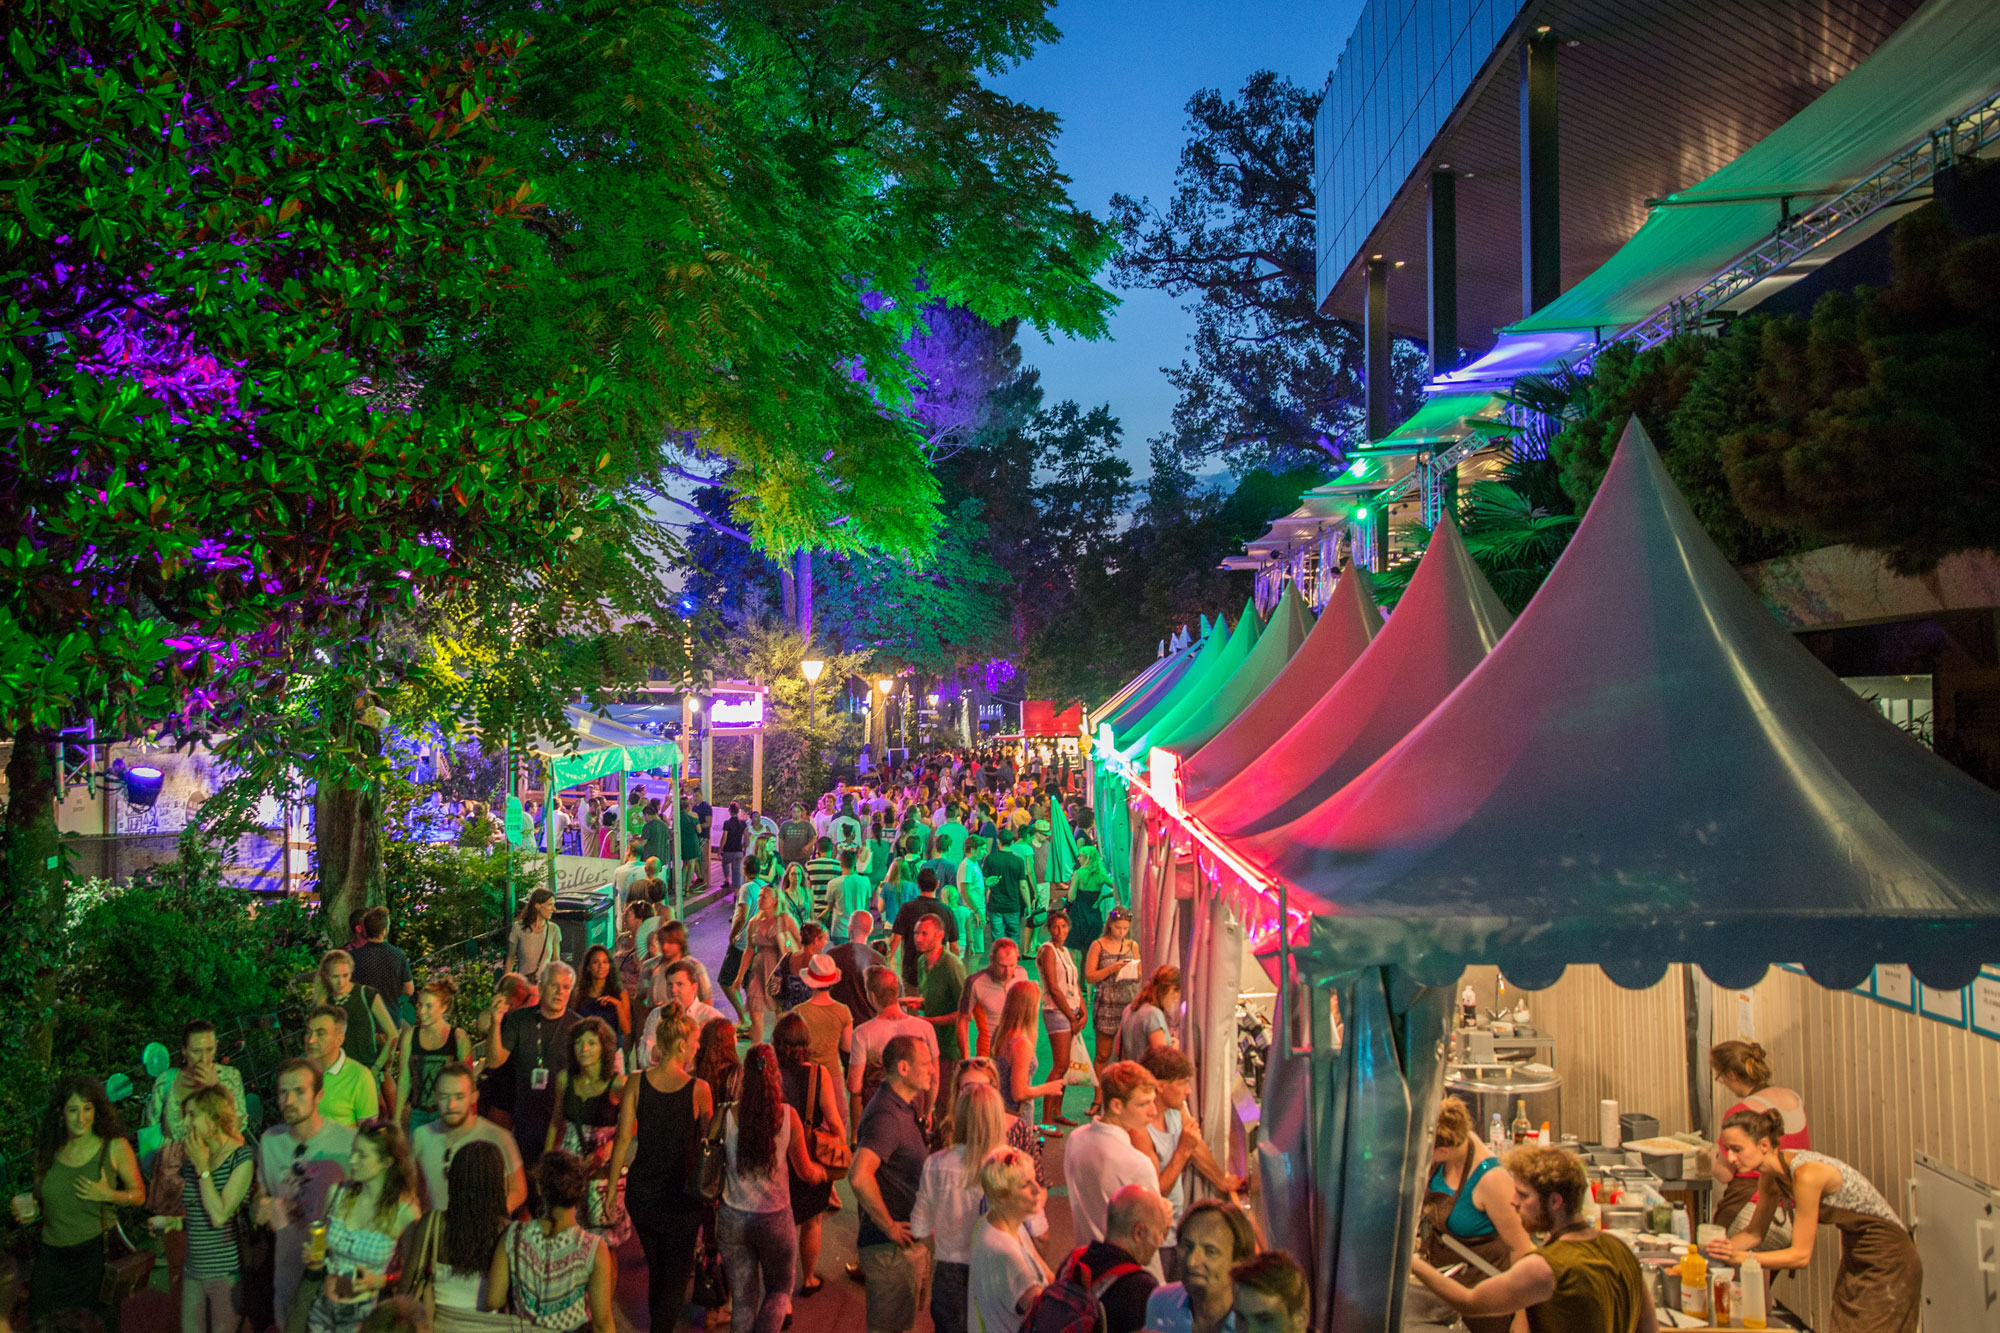 Montreux Jazz Festival >> The Montreux Jazz Festival A Shrine For Musicians Luxurious